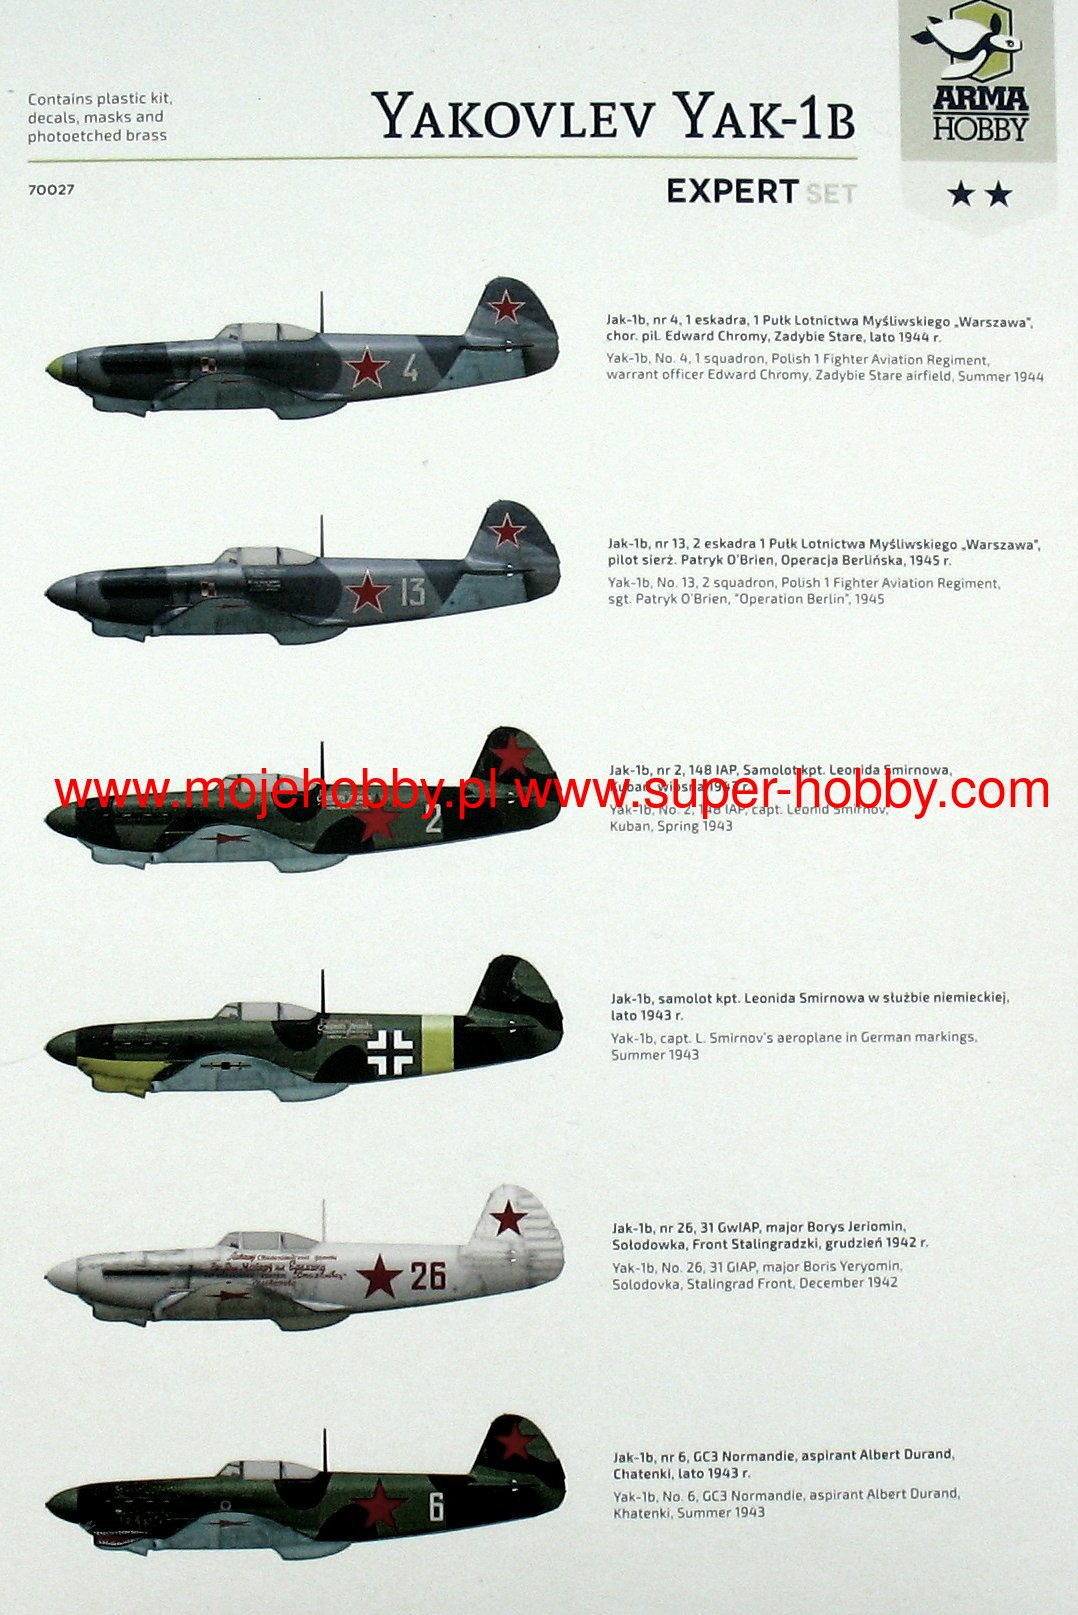 Arma Hobby Yakovlev Yak-1b Expert Set in 1//72